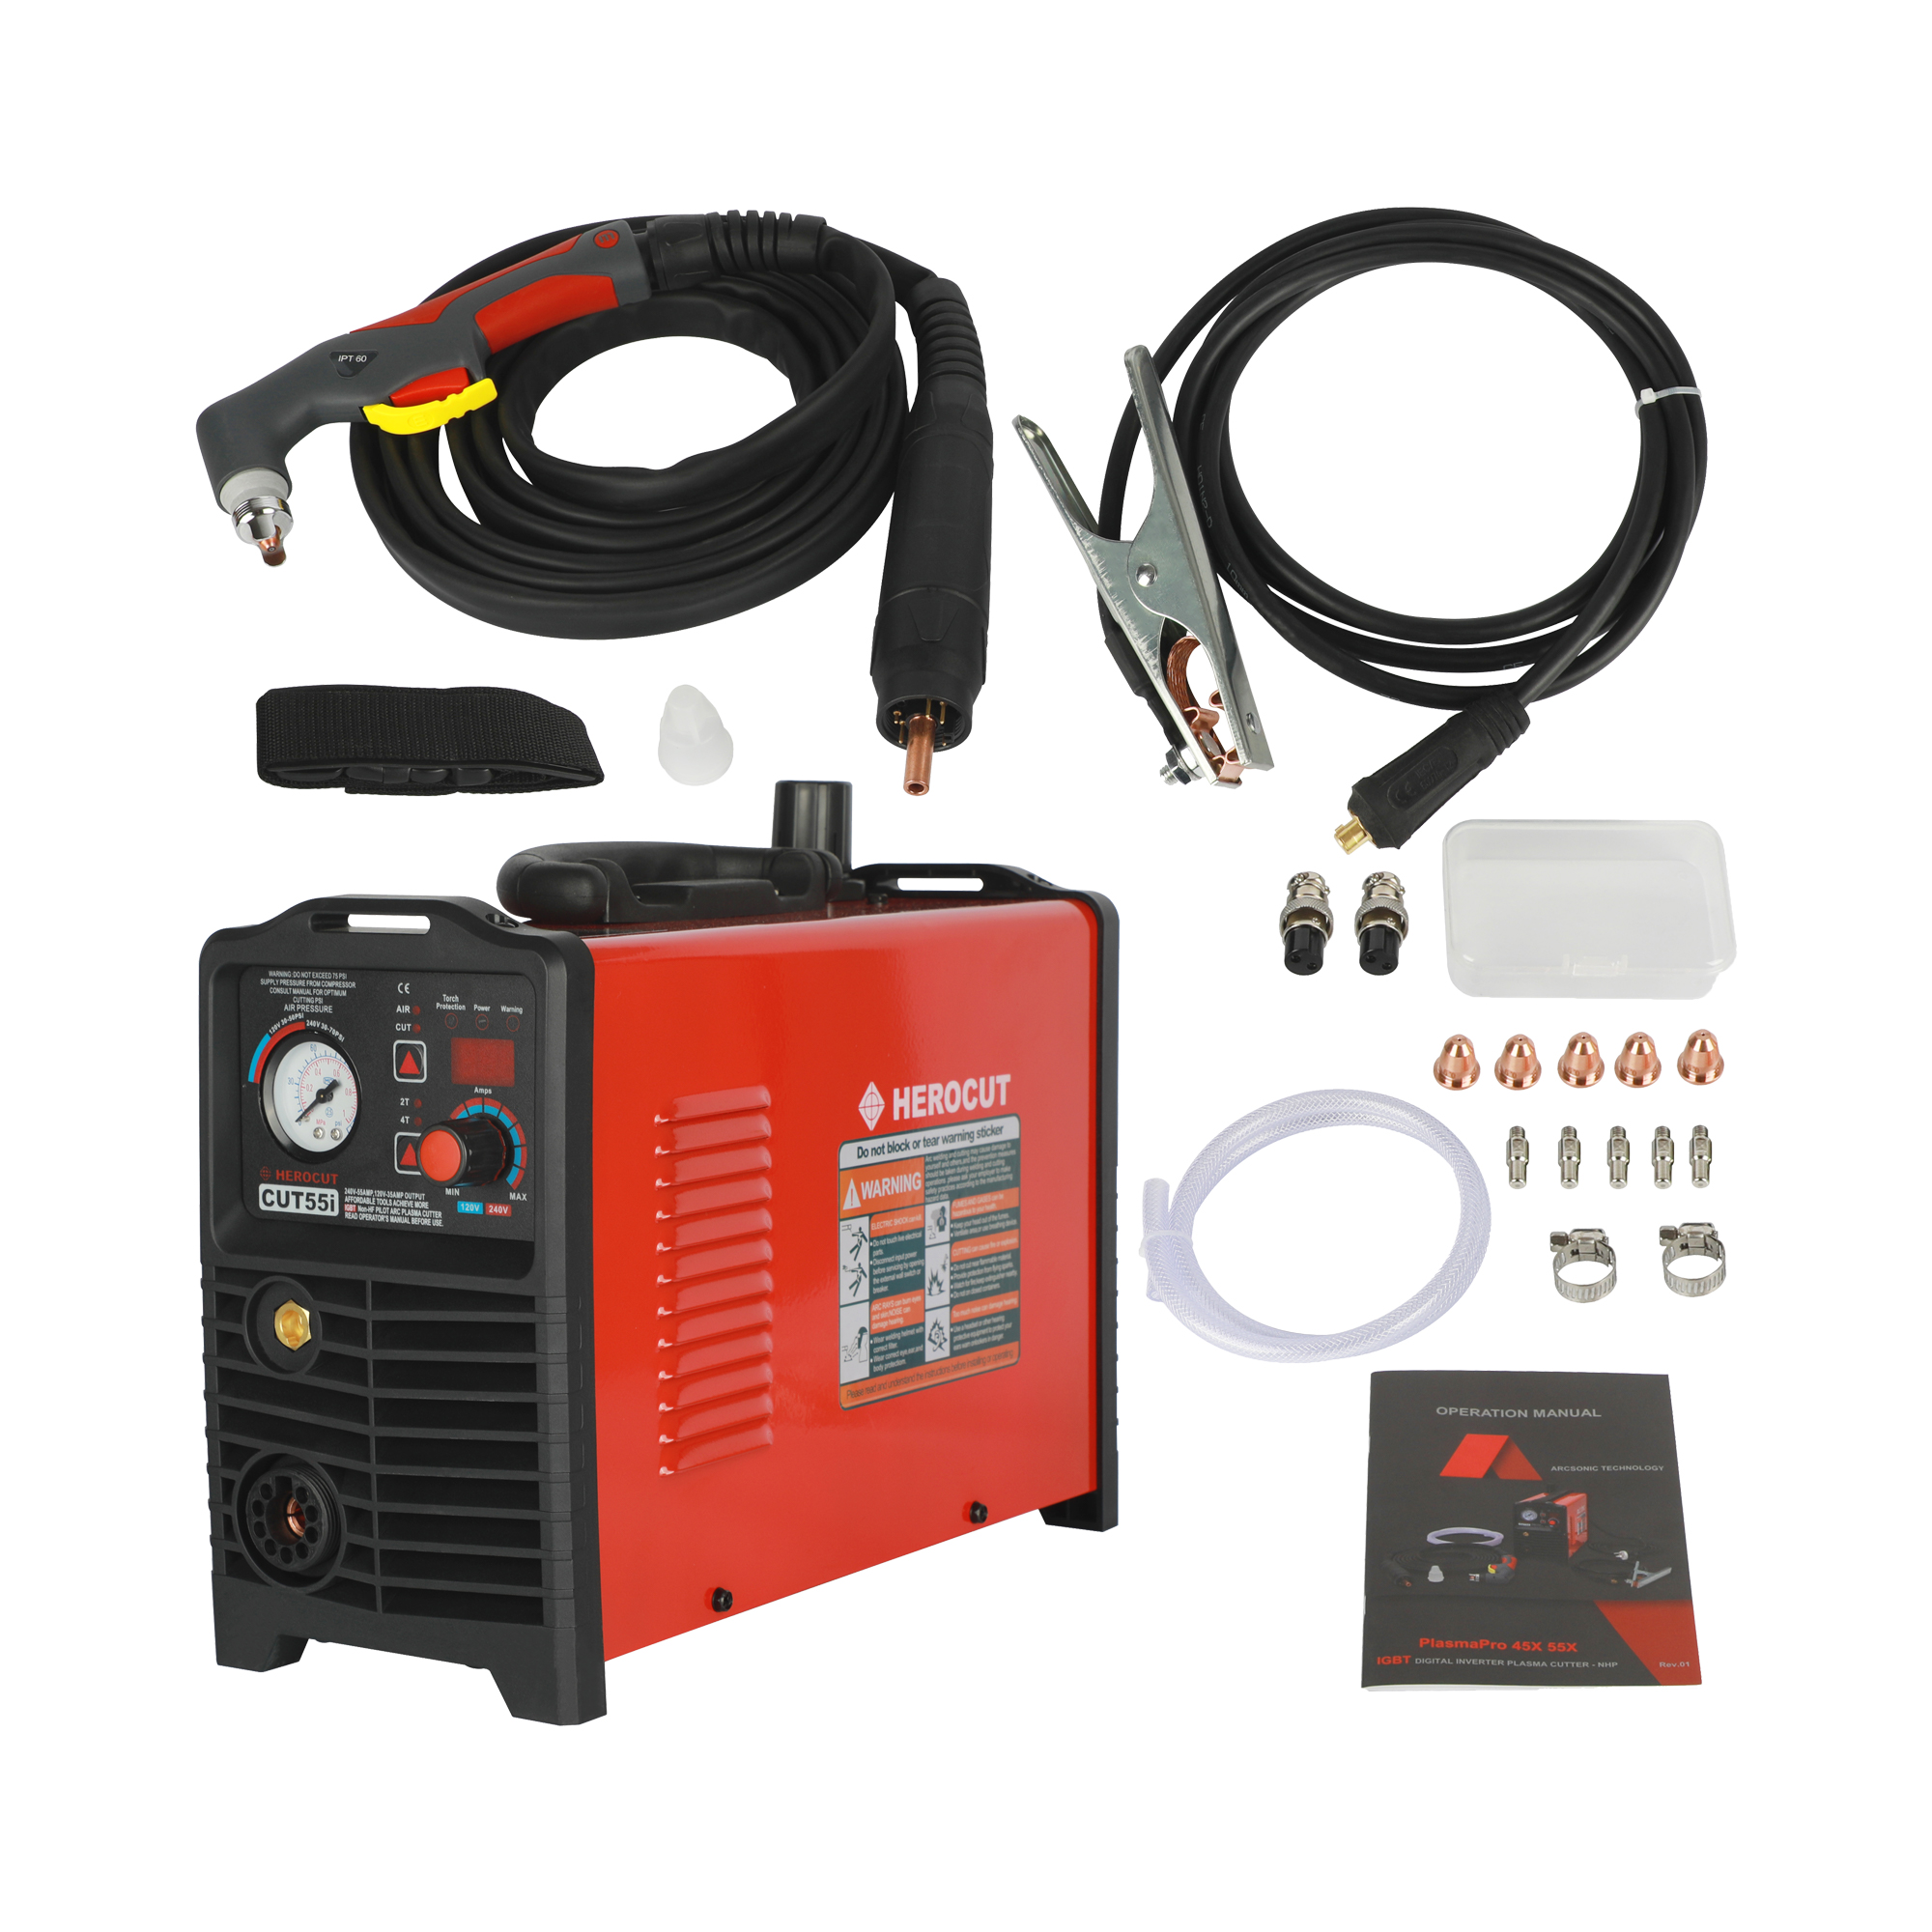 CNC IGBT Cut55i LCD Blow-back Non-HF Pilot Arc Plasma Cutting Machine Voltage 120V/240V, Plasma Cutter CNC